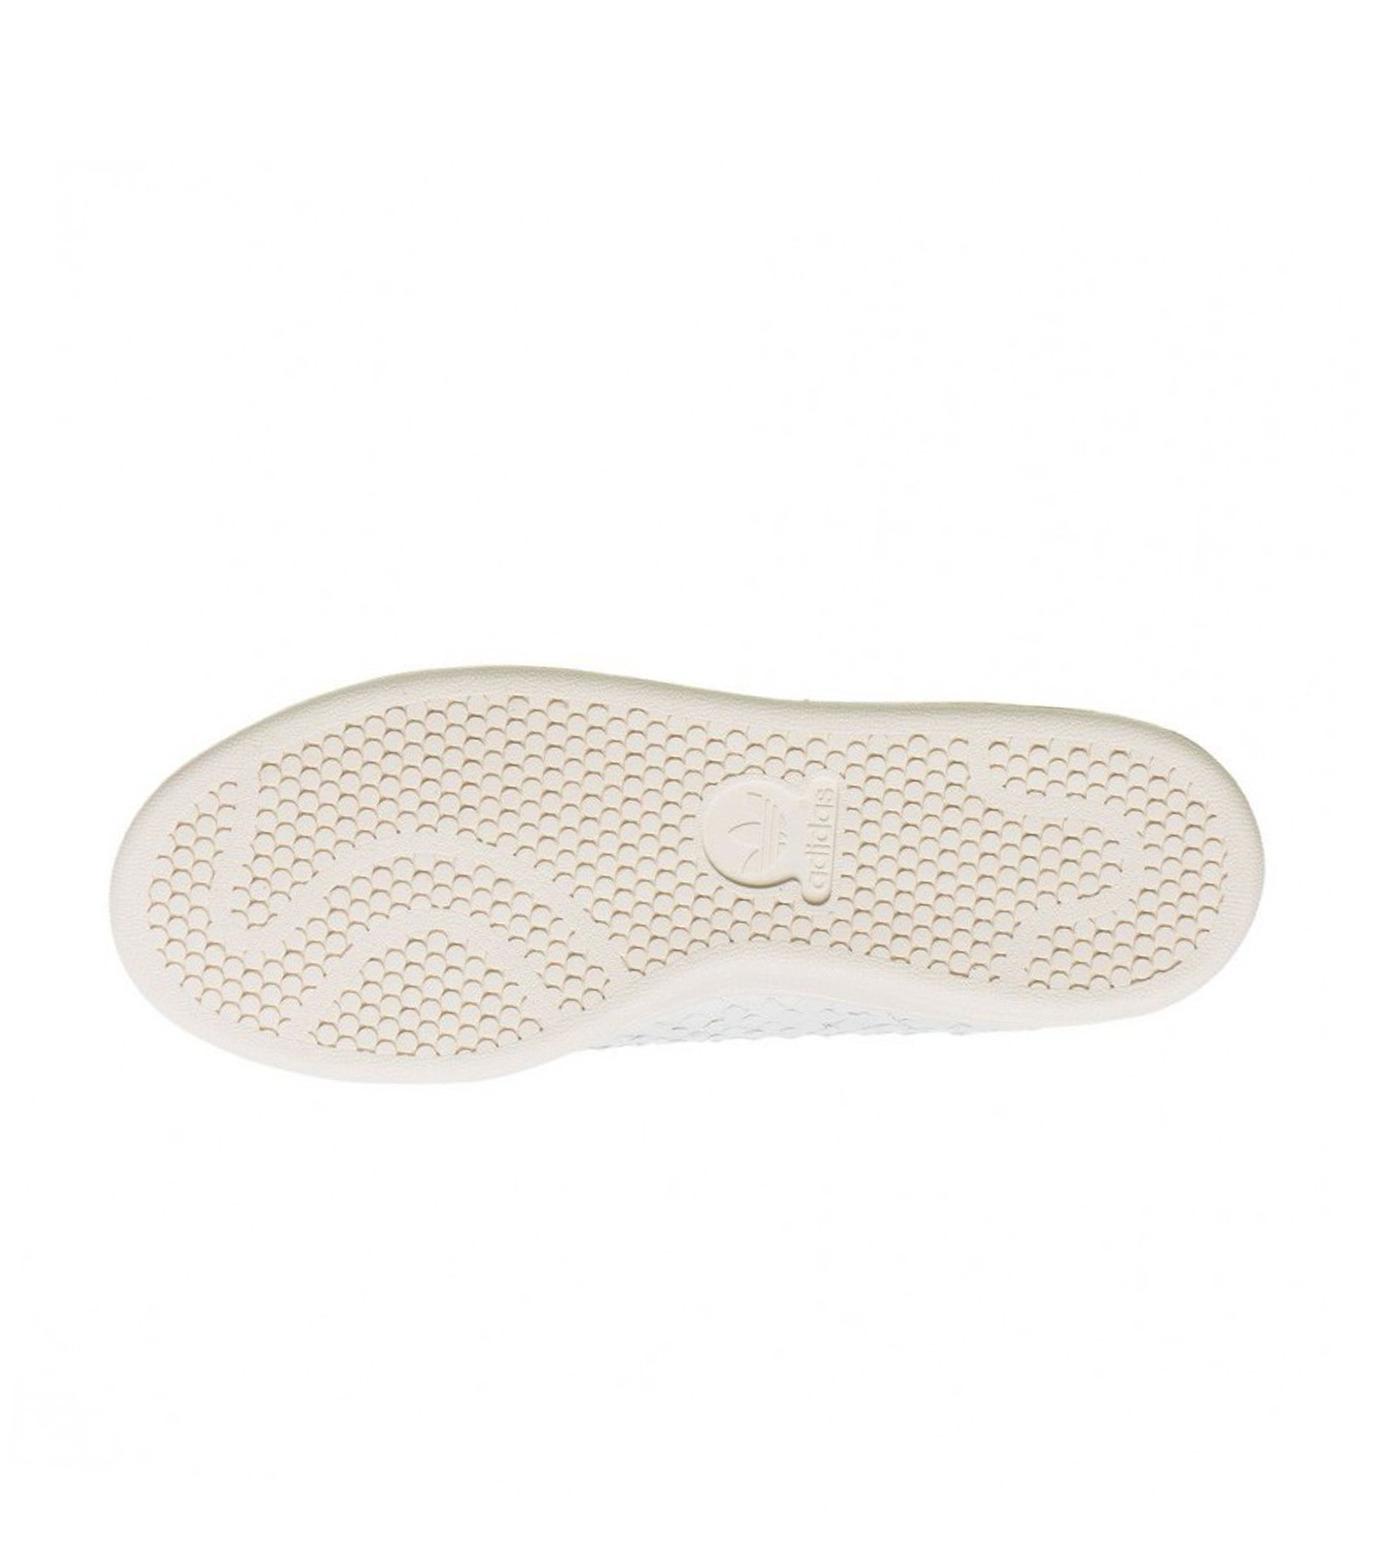 adidas(アディダス)のSTAN SMITH W-WHITE(シューズ/shoes)-S76665-4 拡大詳細画像2